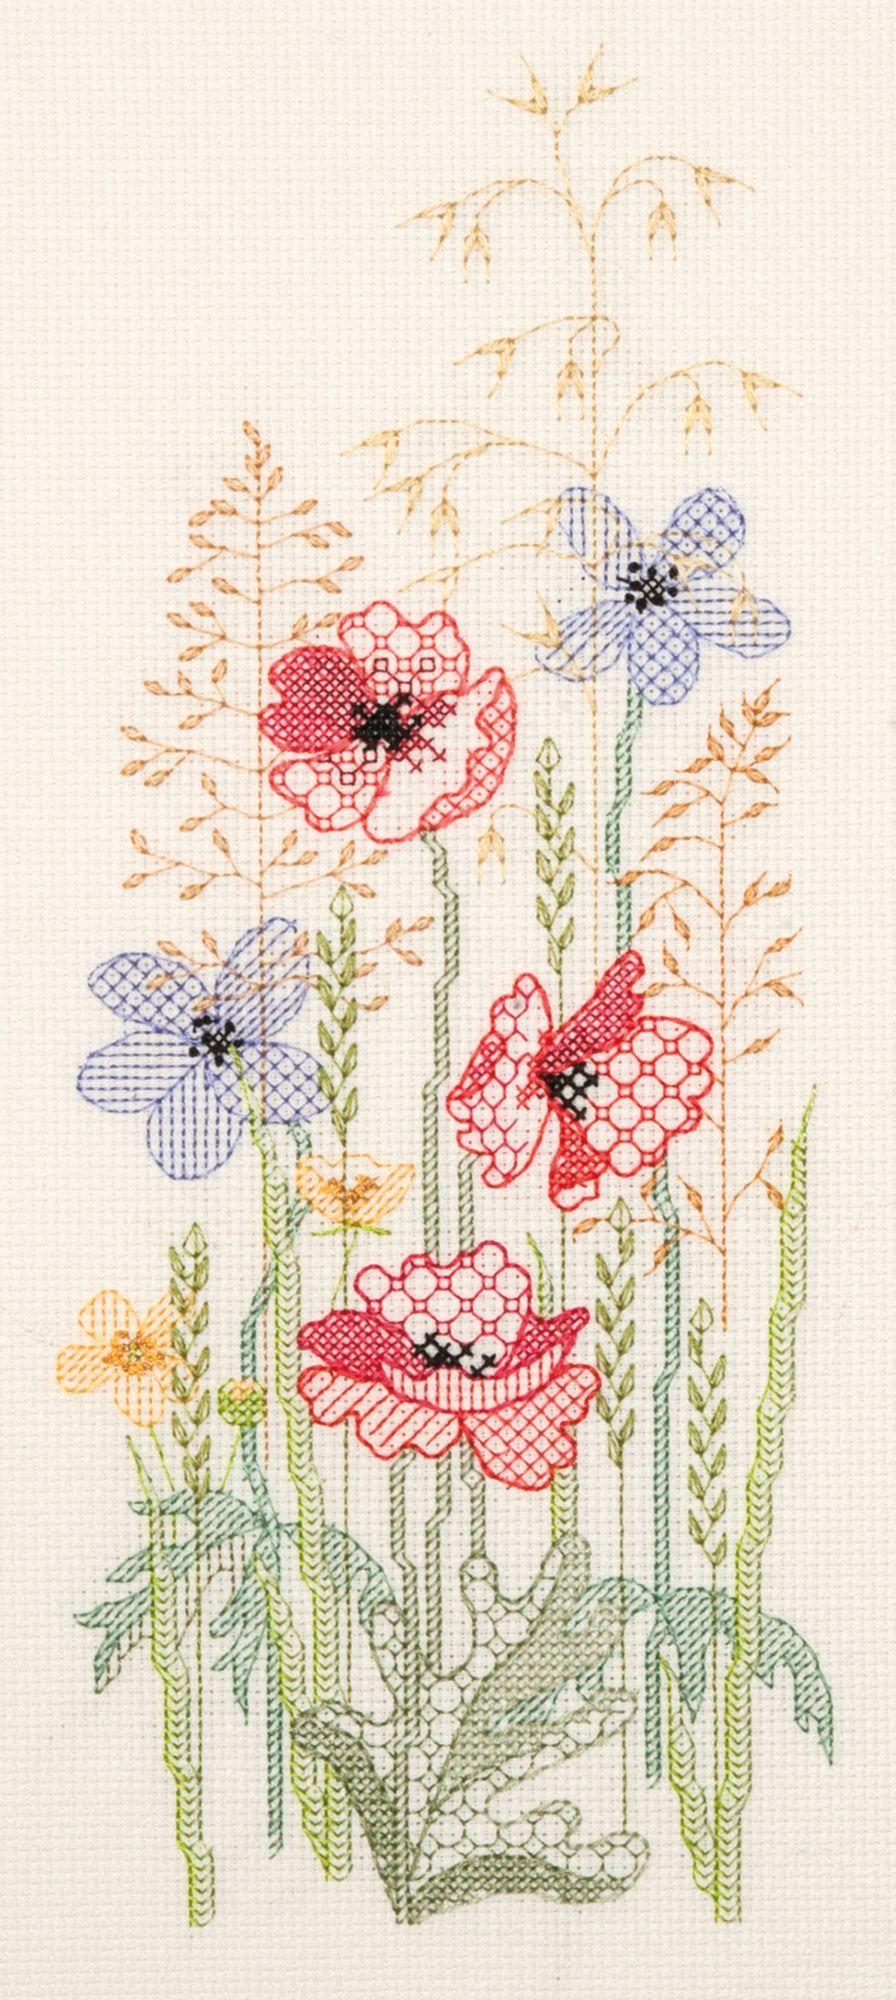 Derwent  SP02 embroidery Panels range - SP02